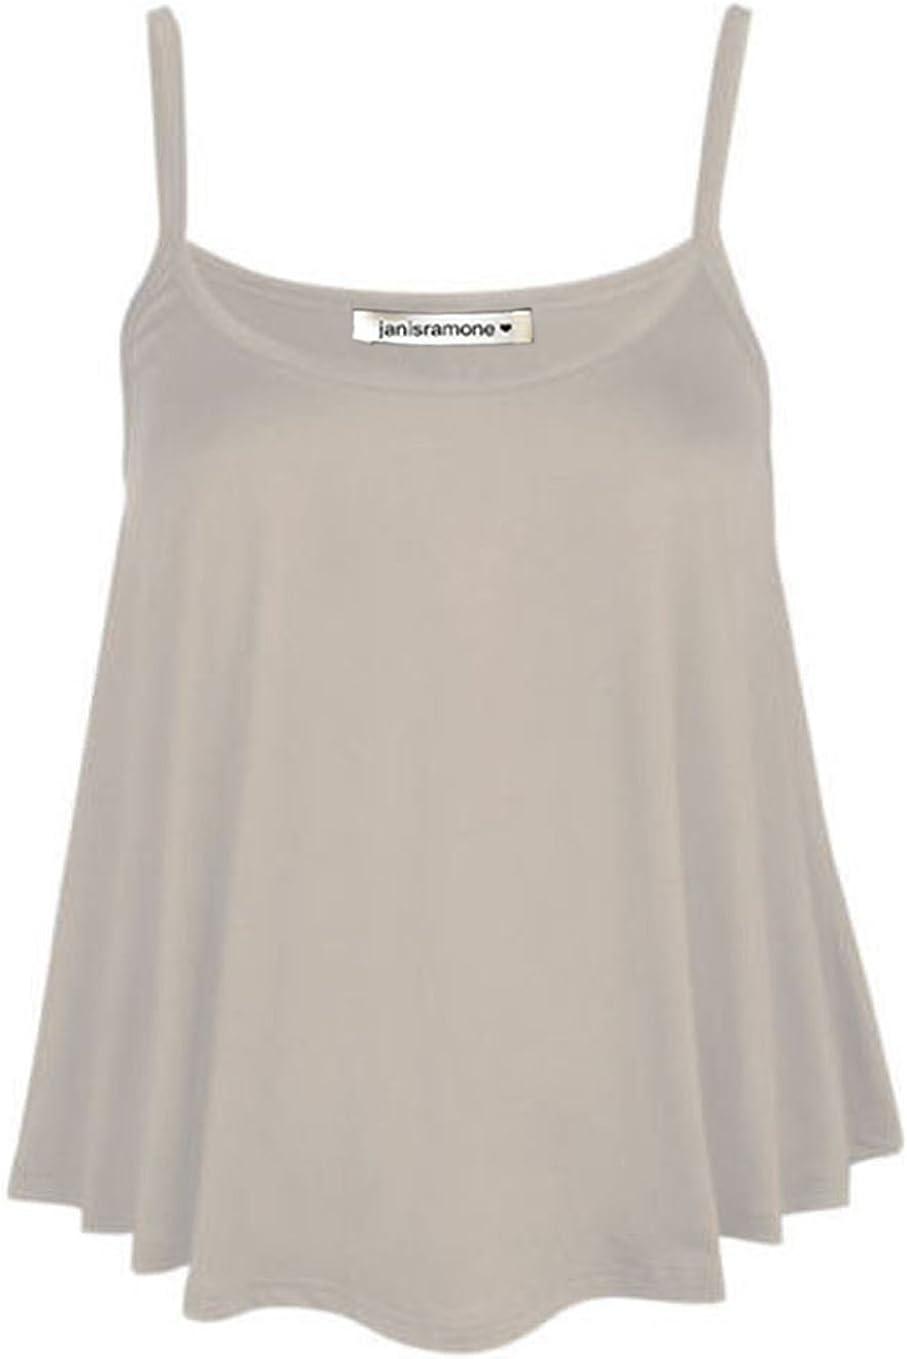 janisramone Womens Ladies New Plain Sleeveless Swing Strappy Camisole Cami Vest Plus Size Flared Mini Top